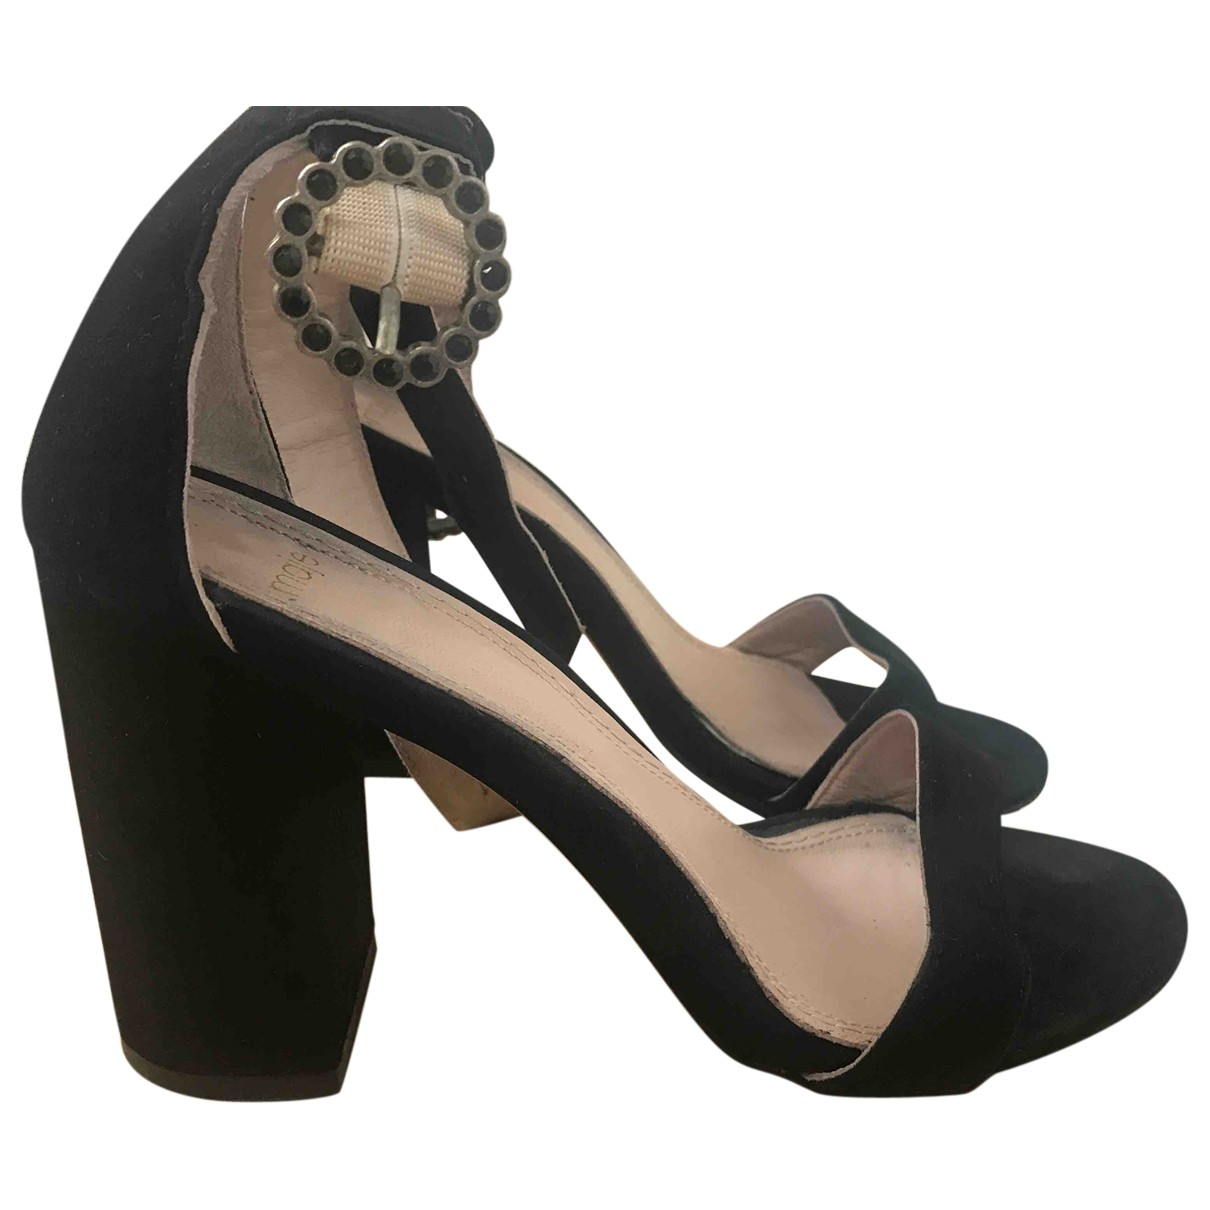 Maje \N Black Suede Sandals for Women 37 EU